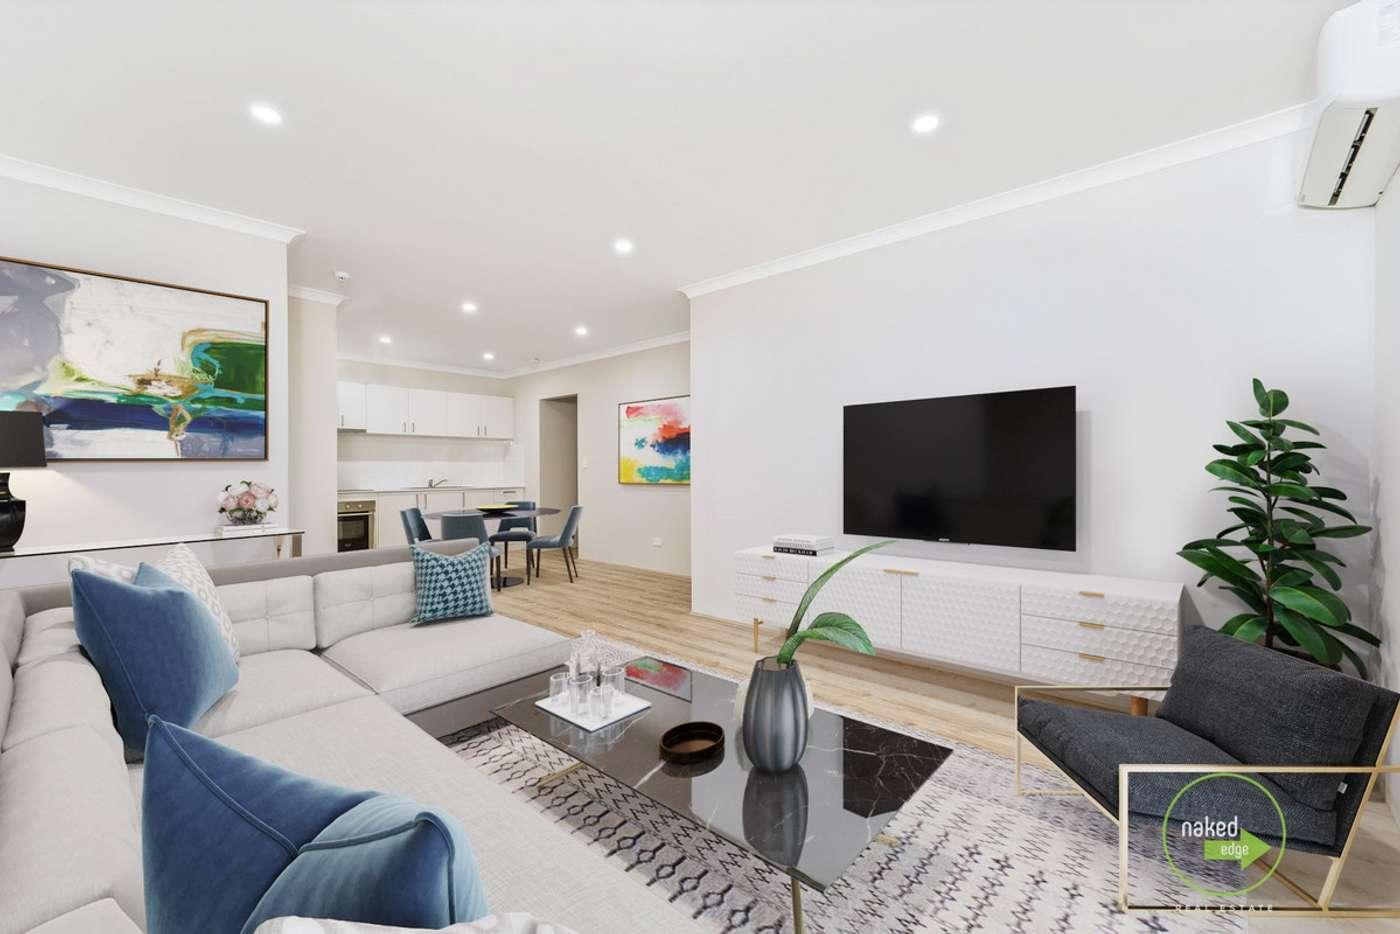 Main view of Homely apartment listing, 13/8 Blackburn Street, Maddington WA 6109